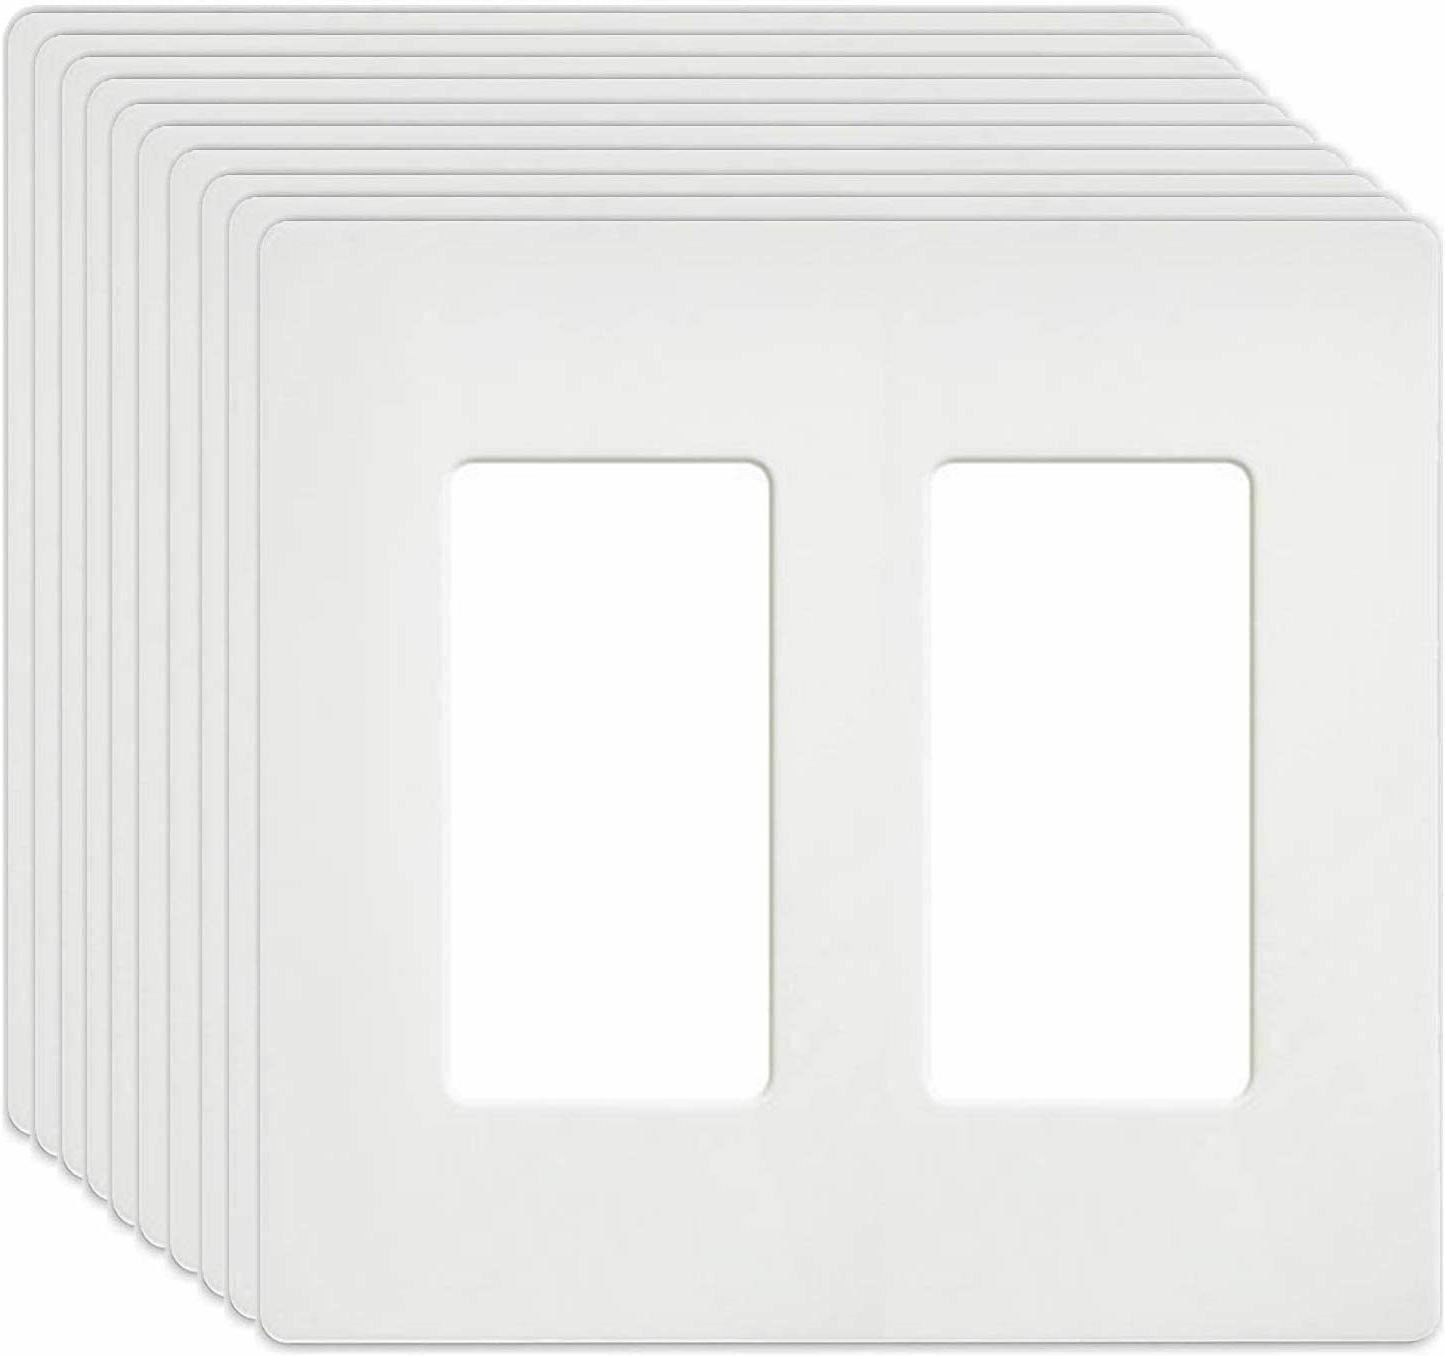 2 gang wall plates standard screwless unbreakable